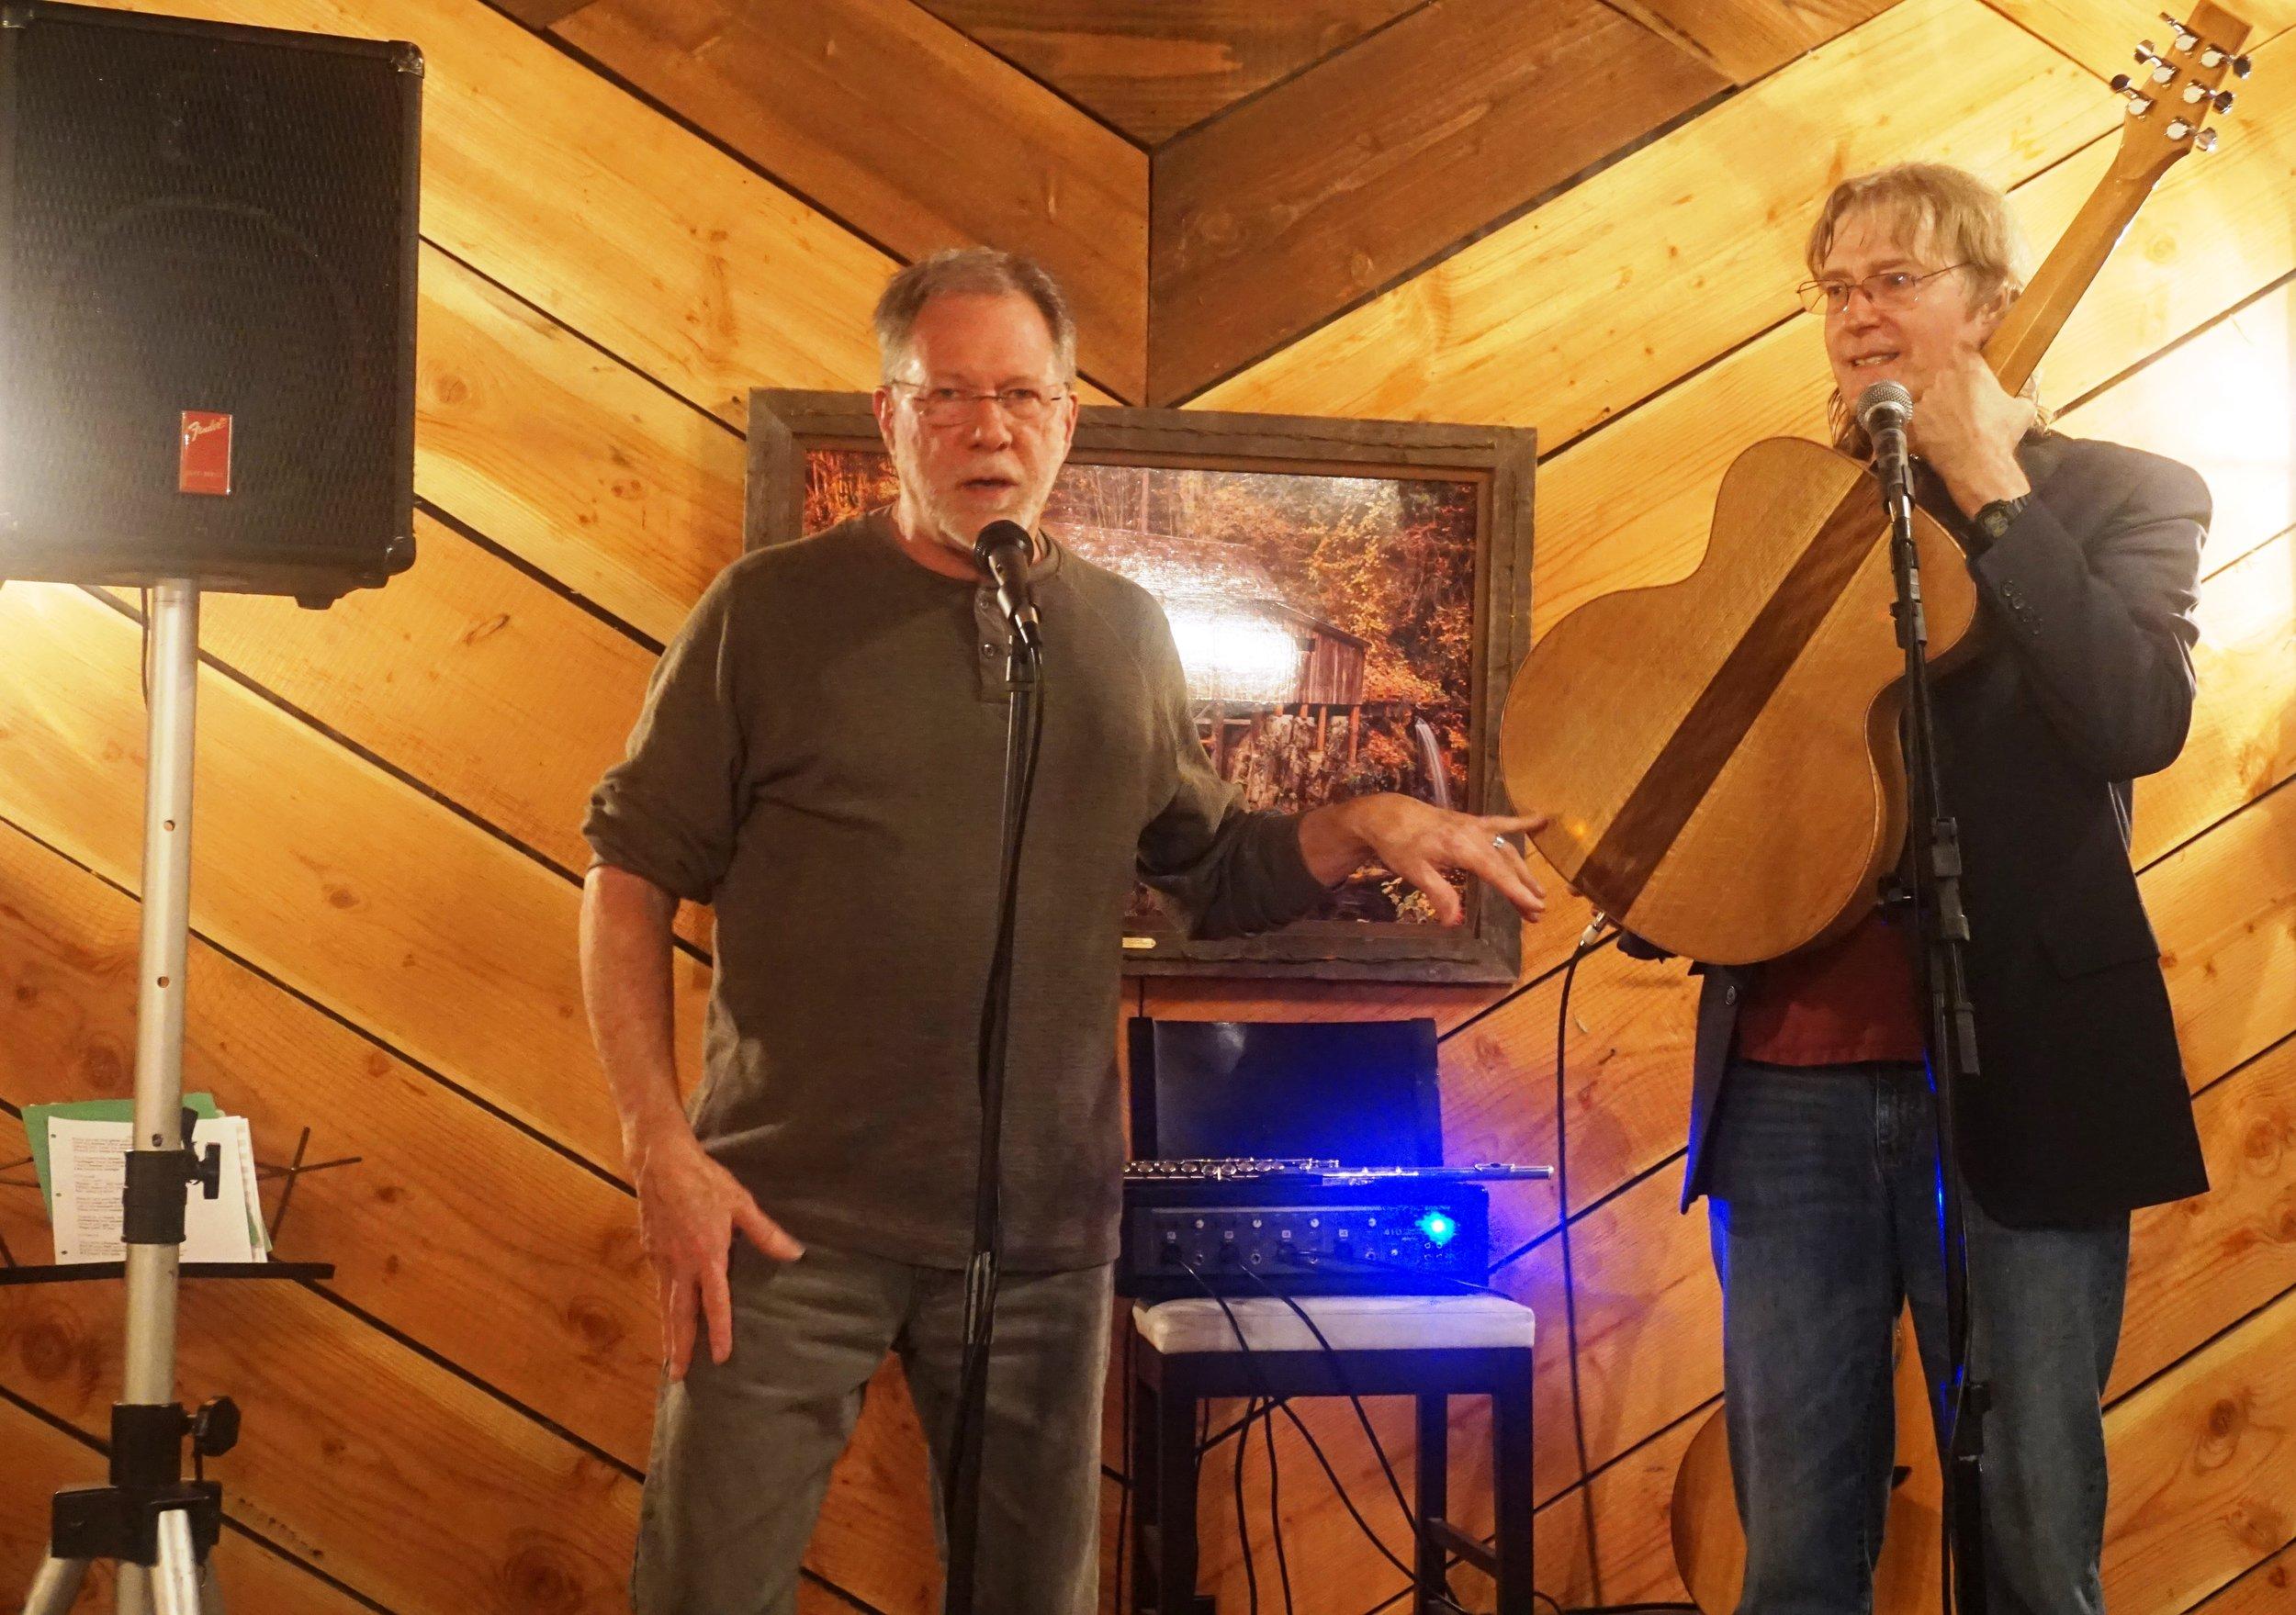 Guitar maker and local musician, Loren Schulte, explaining his inspiration for his second oak stave guitar before Doug Smith trials his handiwork. Viki Eierdam